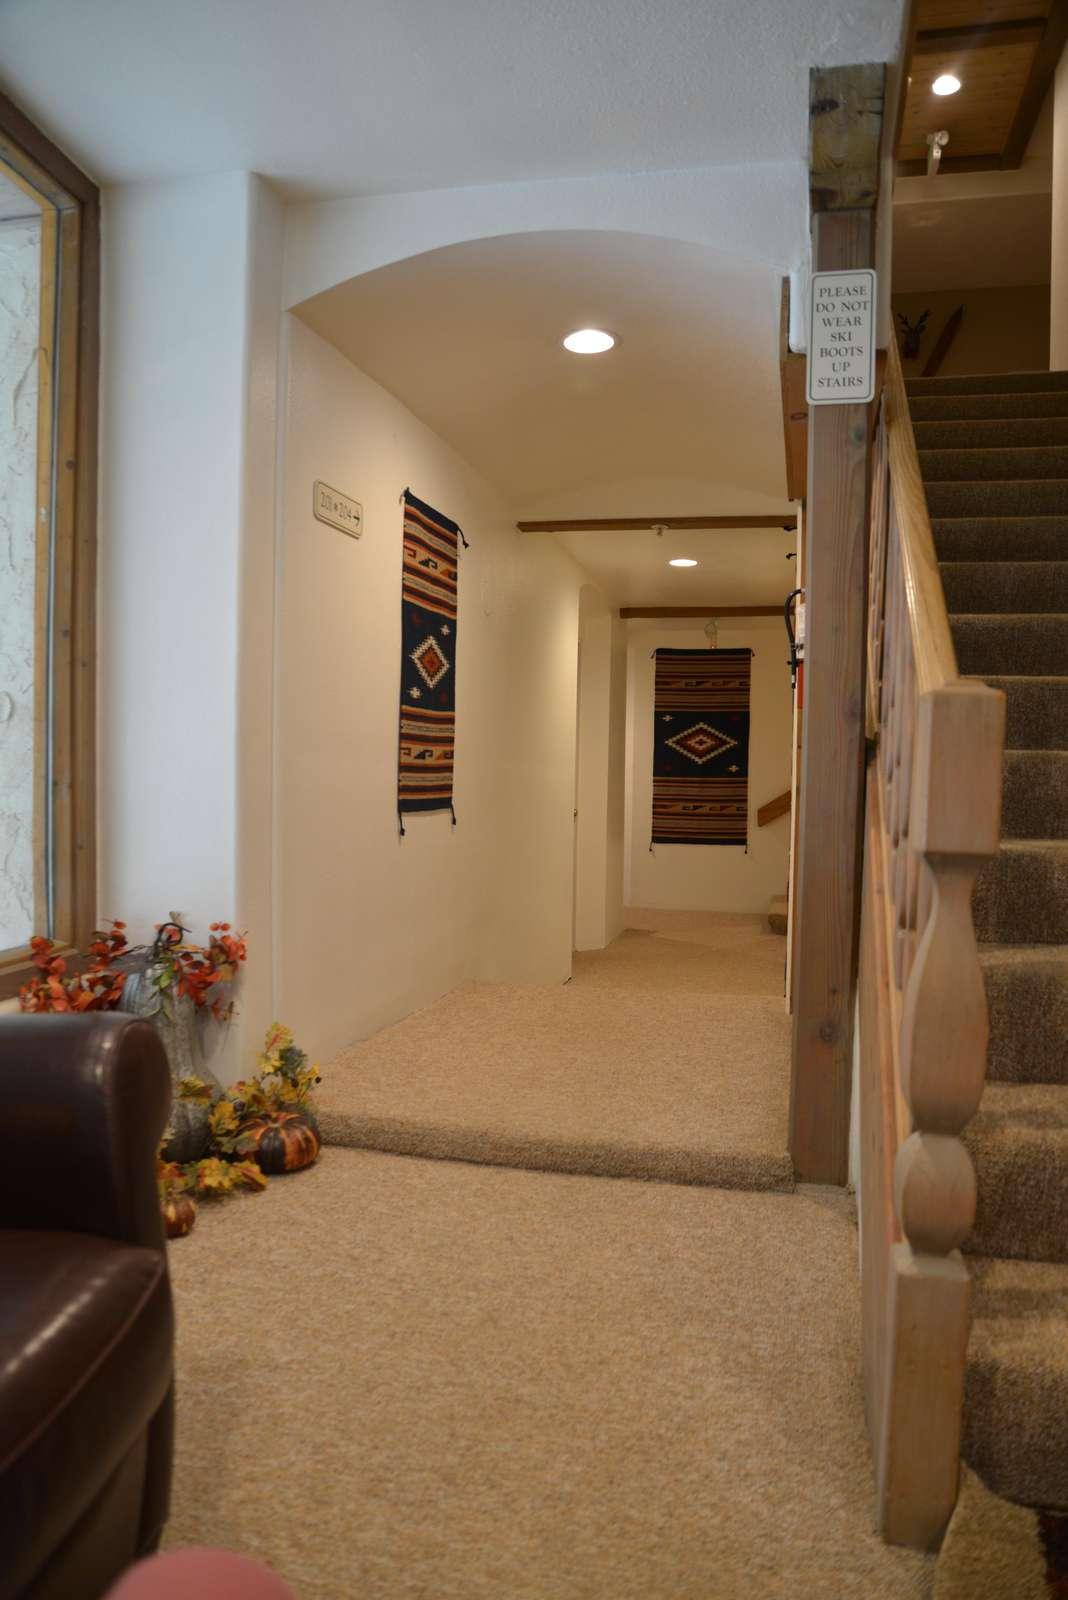 Lobby Level & Hallway/Walkway to our condo